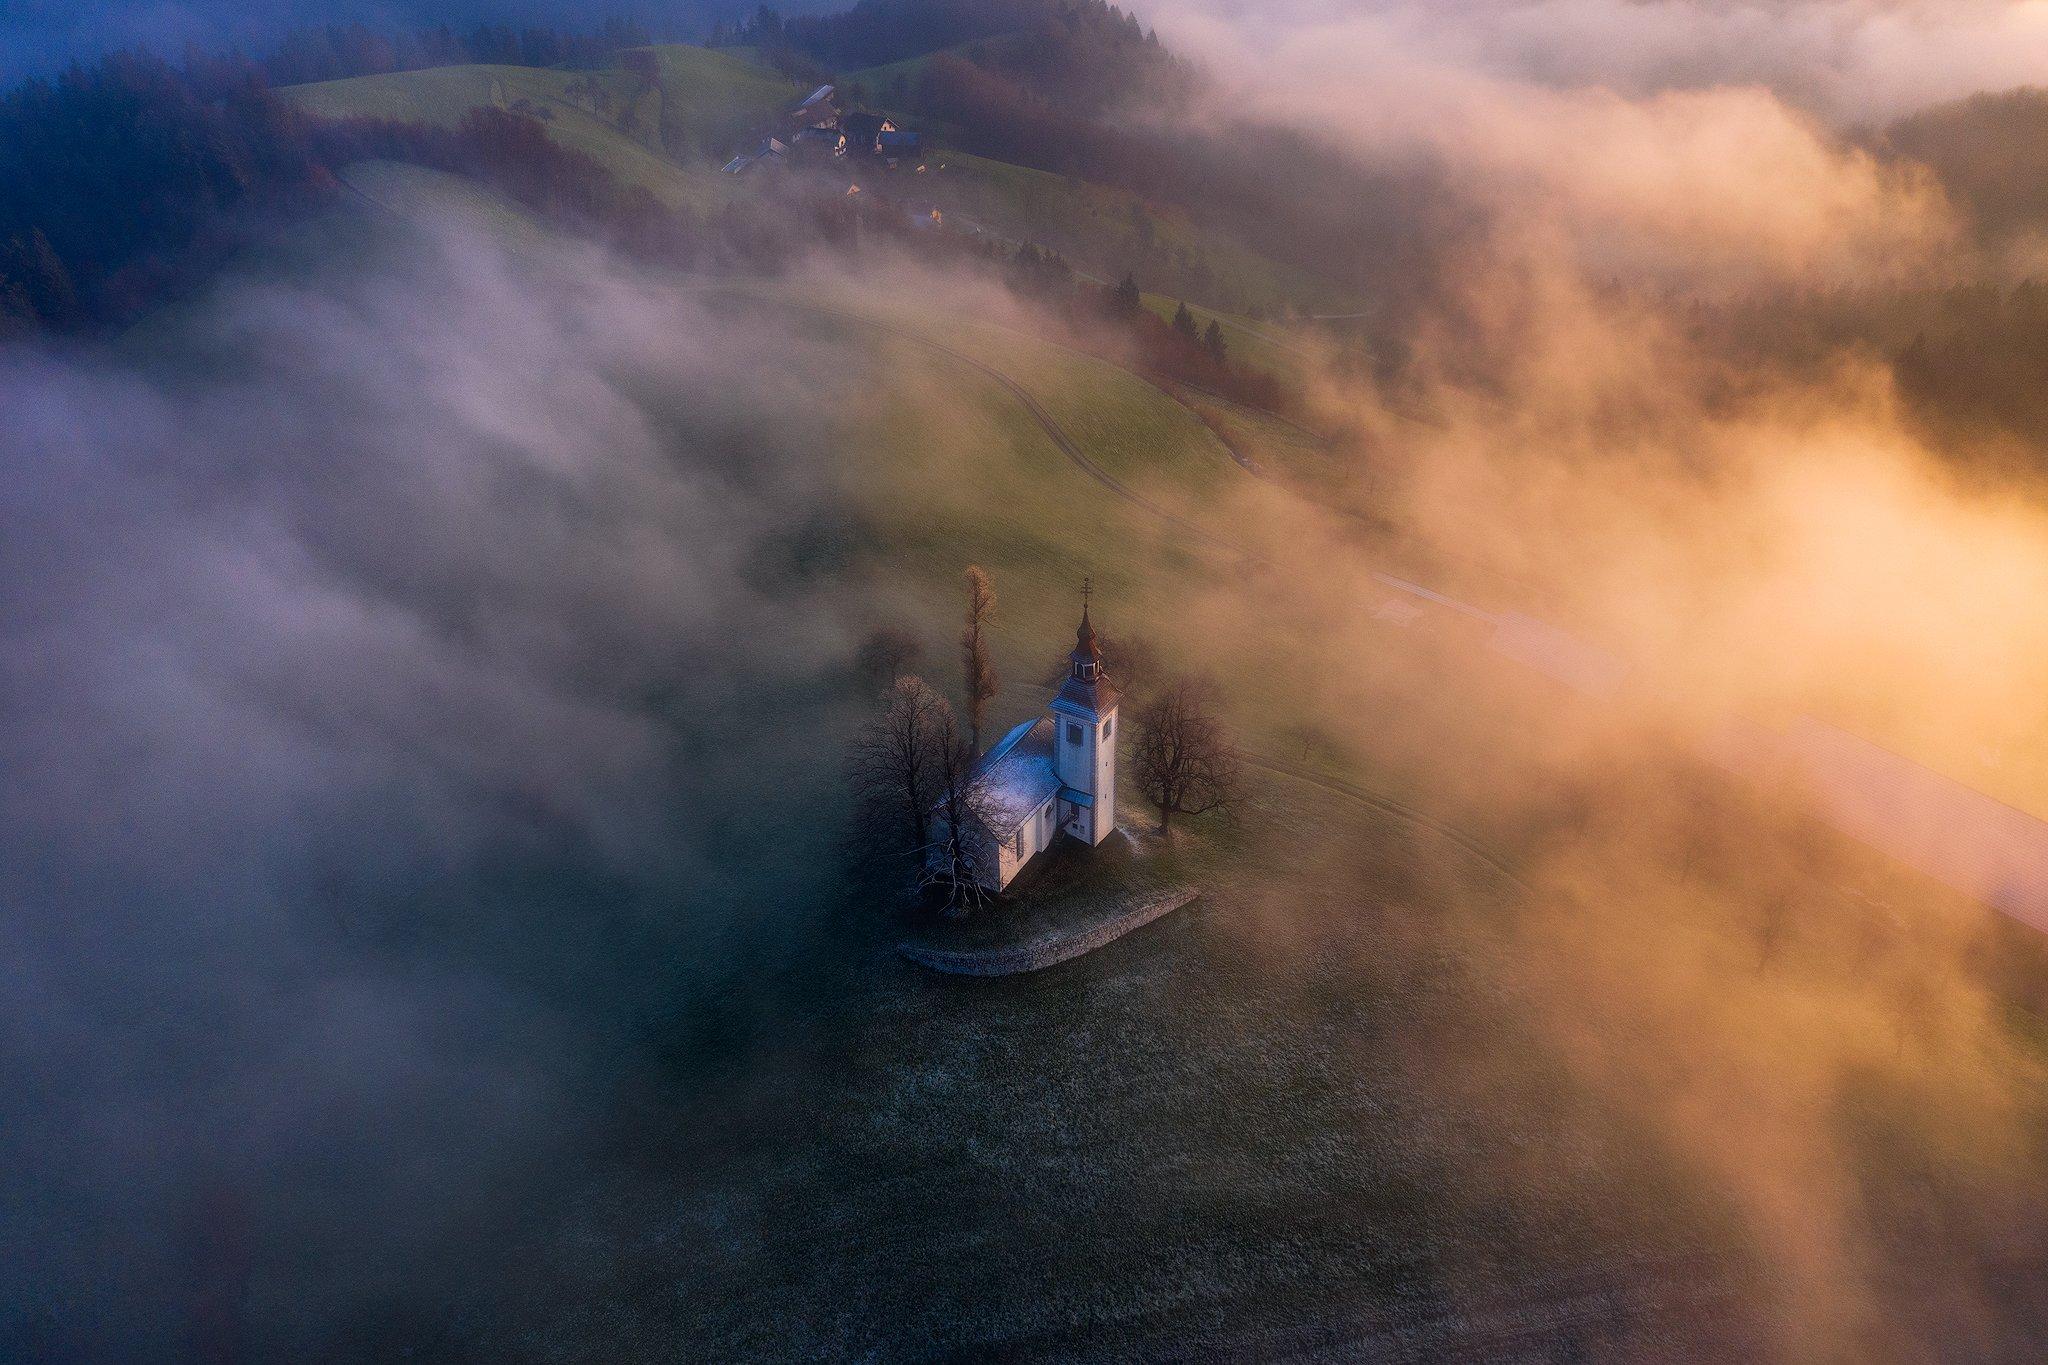 slovenia, landscape, moody, fog, sunrise, Remo Daut